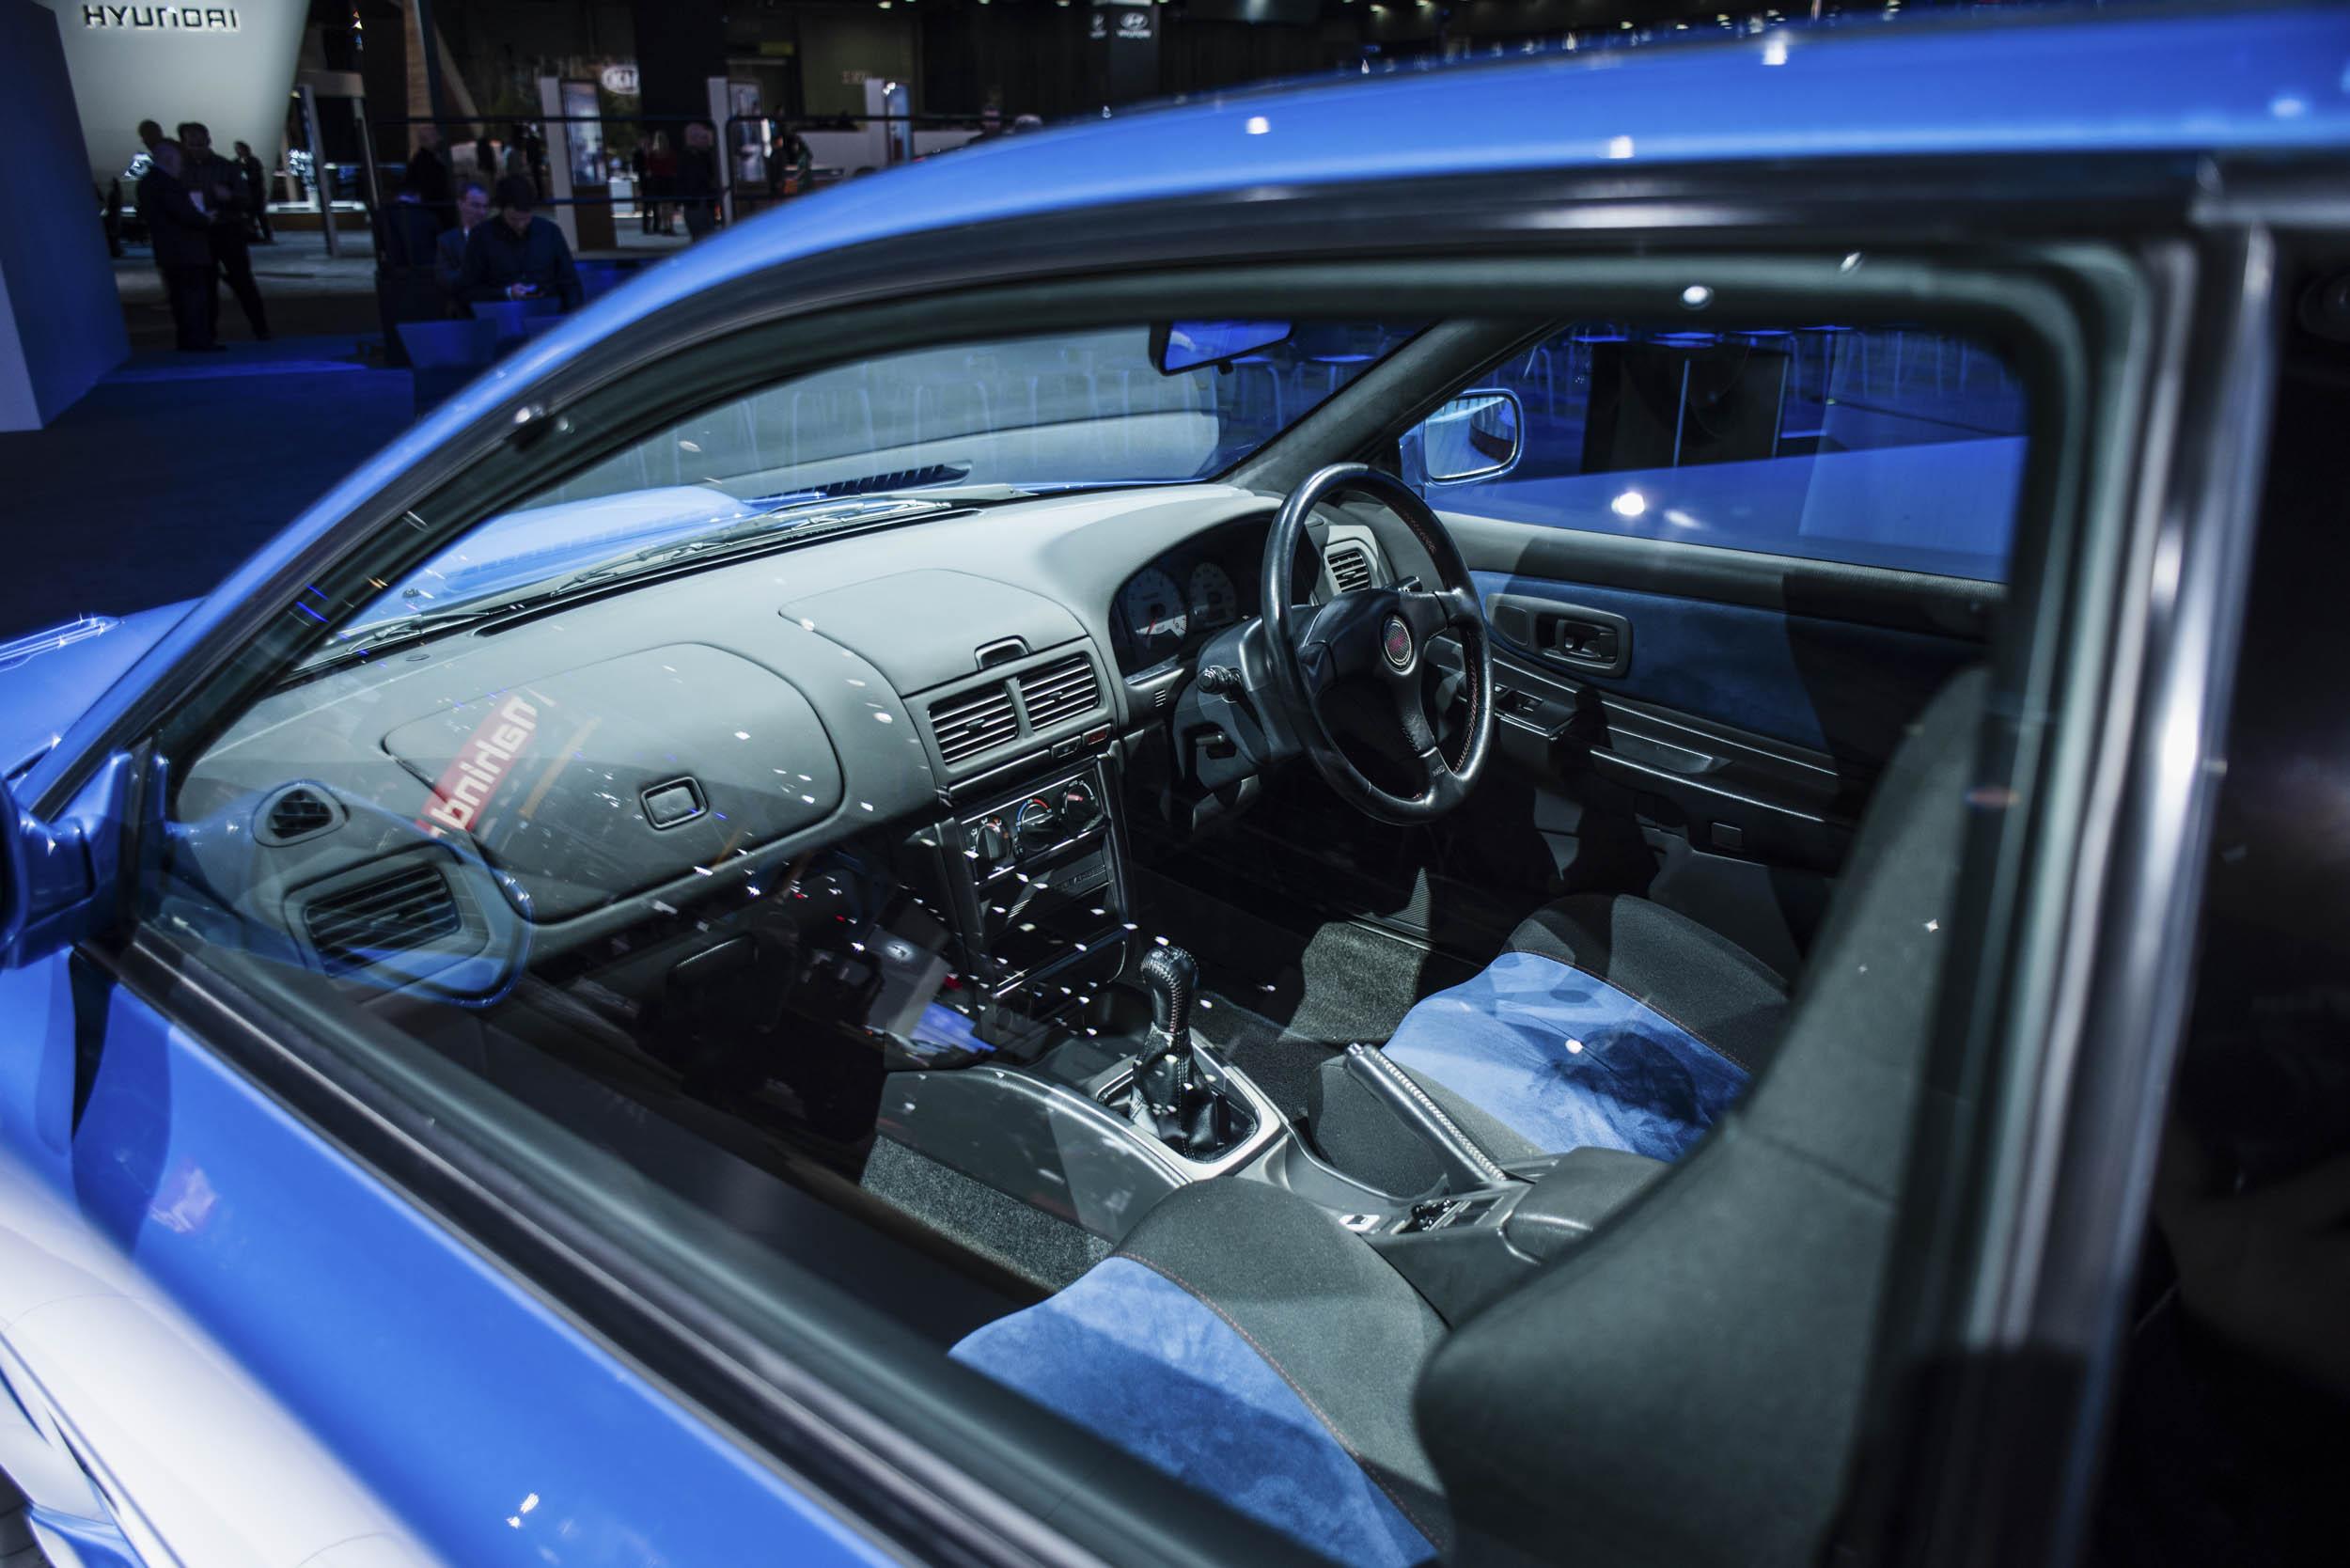 1998 Subaru 22B interior